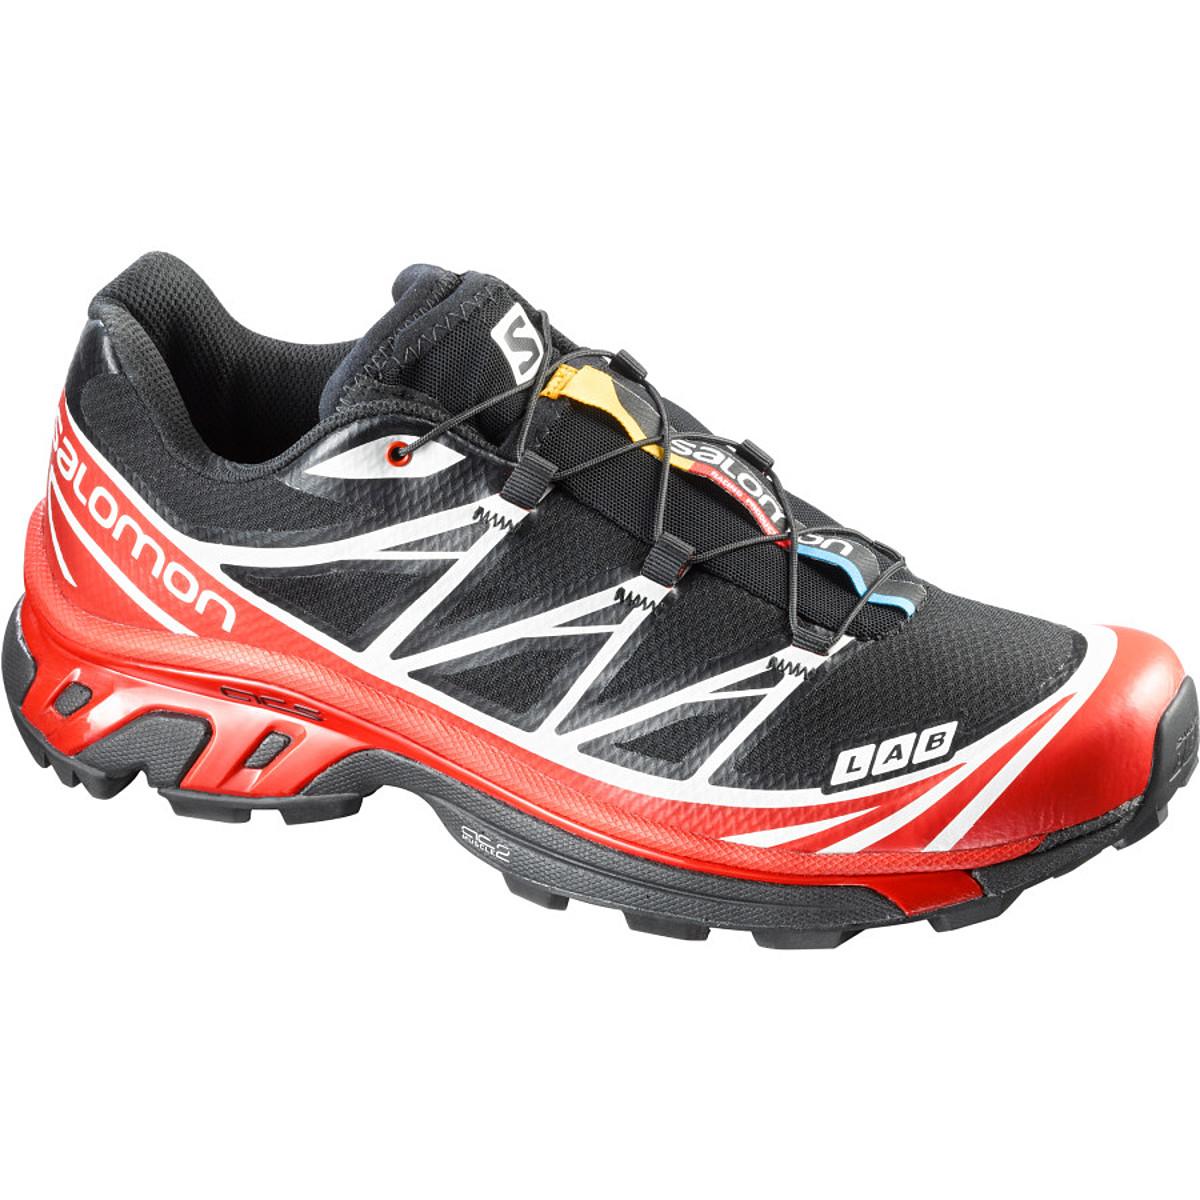 photo: Salomon S-Lab XT 6 trail running shoe